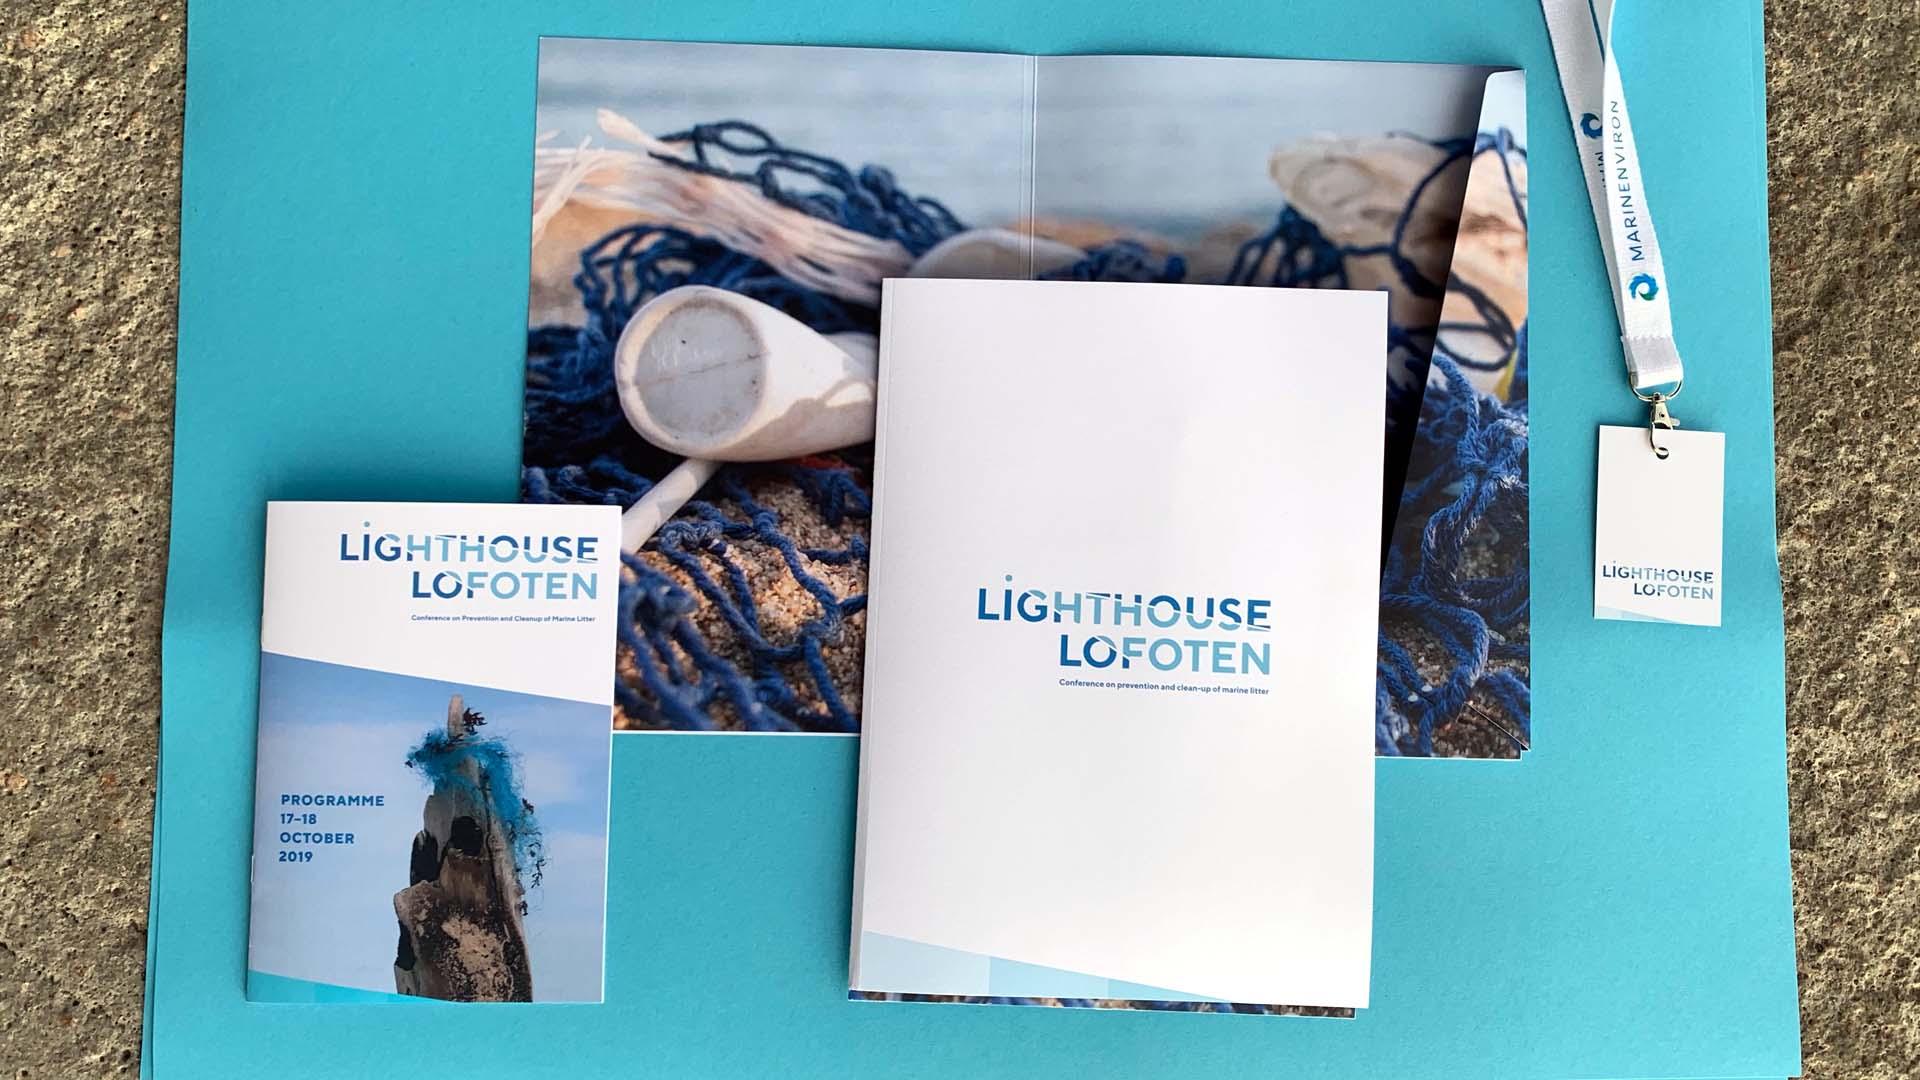 Lighthouse Lofoten